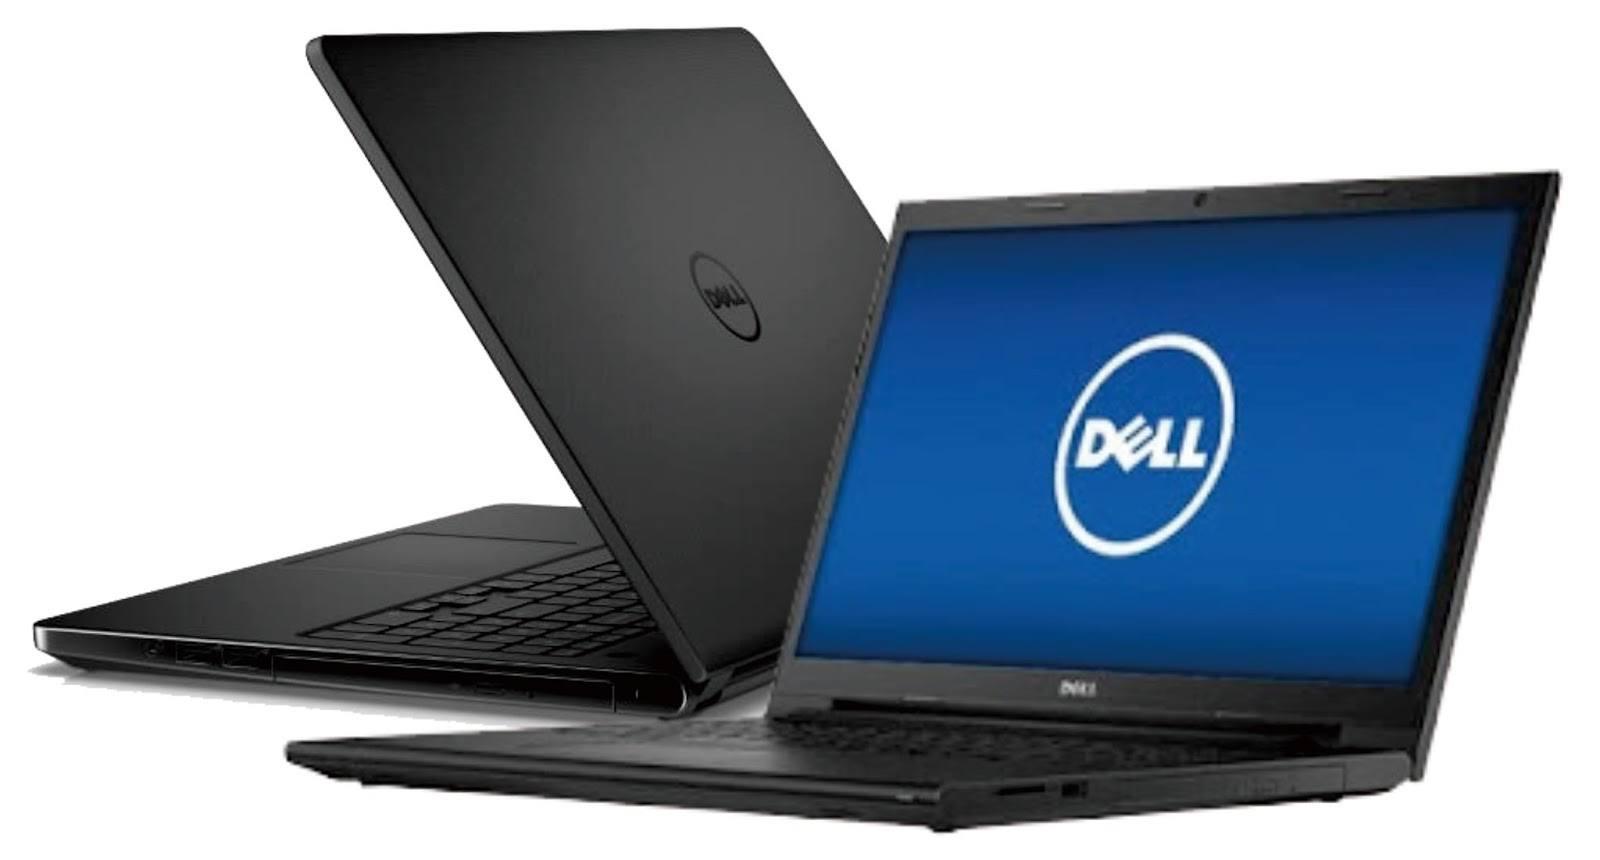 Best Indian Laptops Under 25000